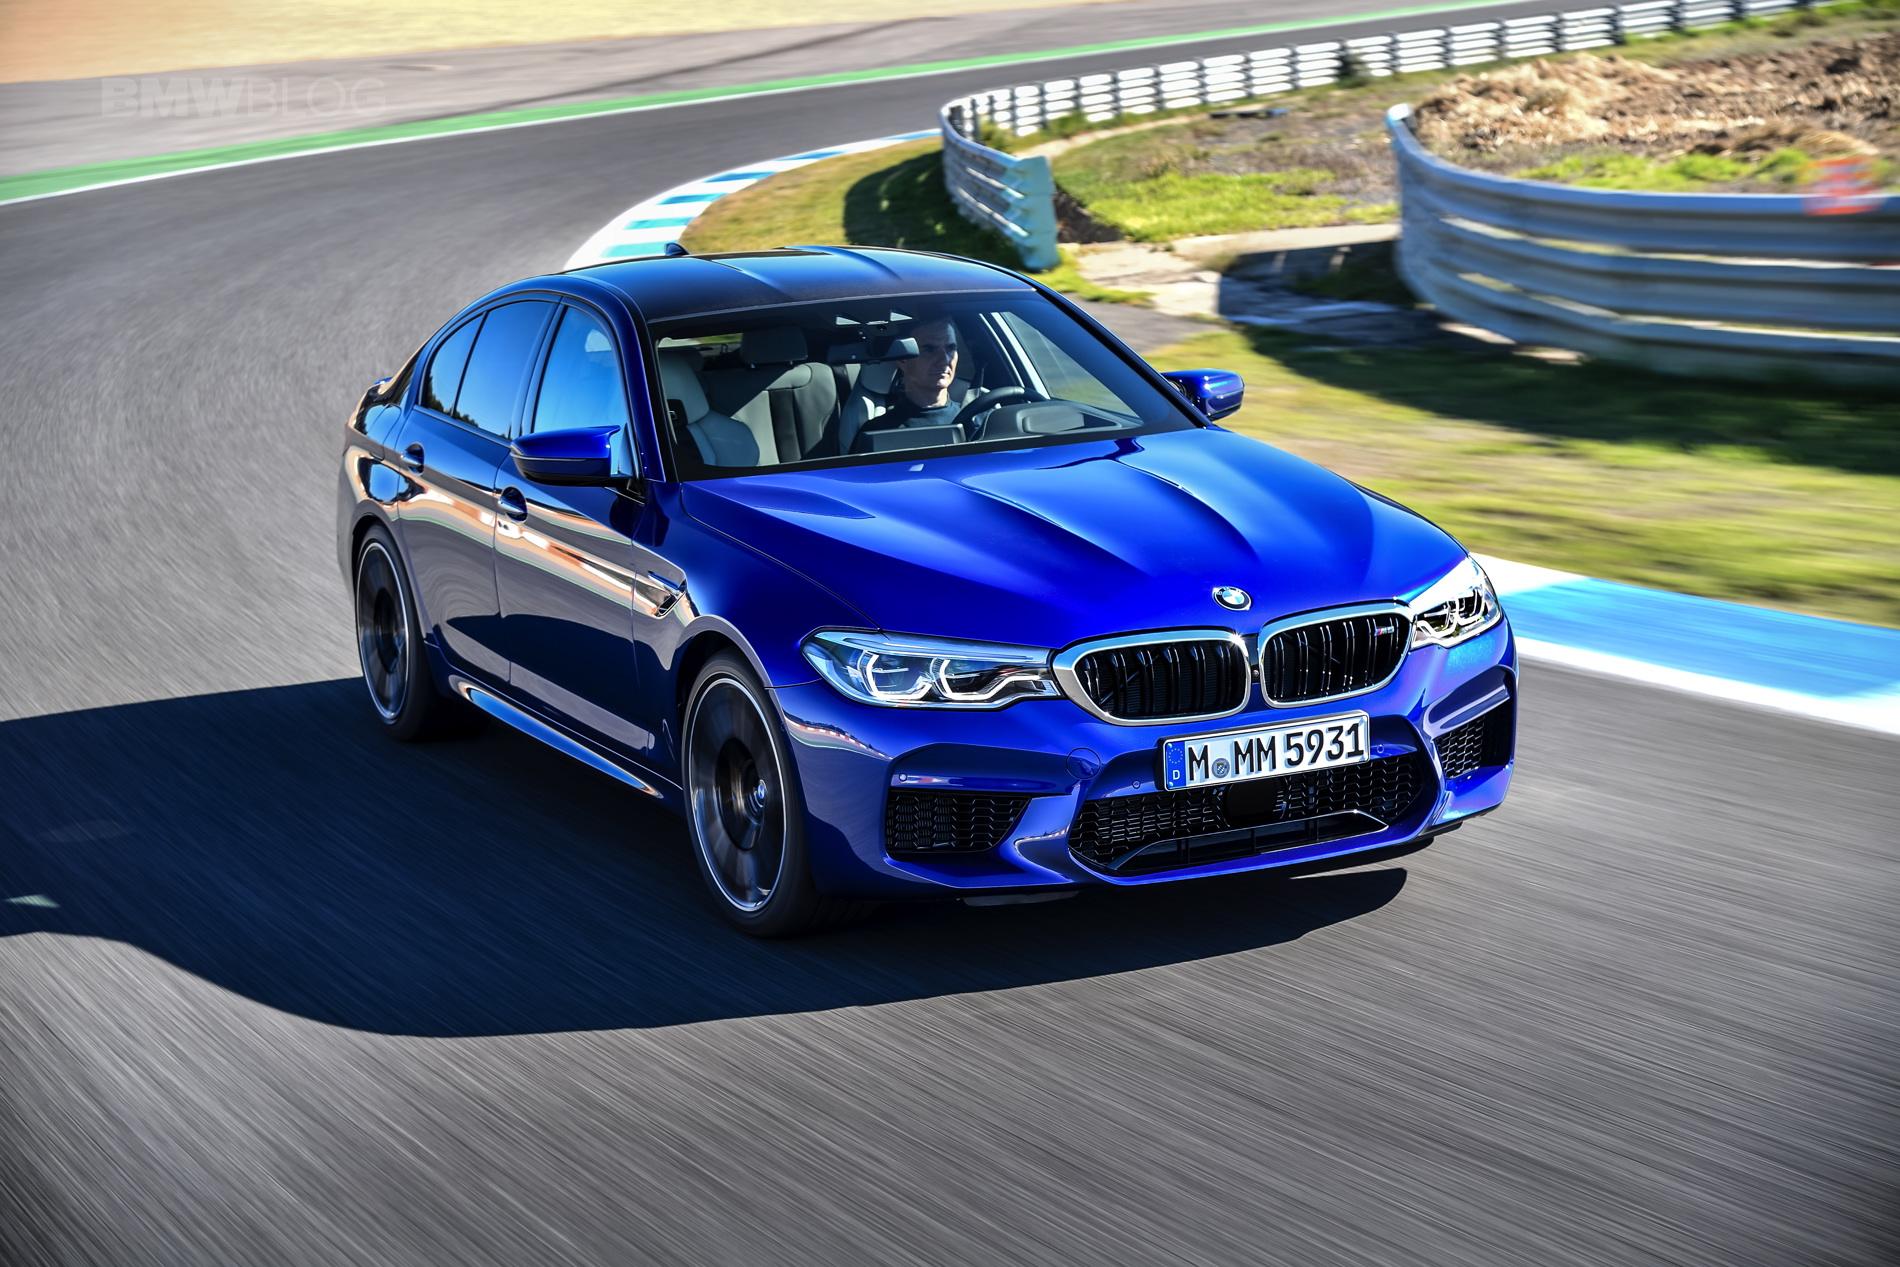 2018 BMW M5 test drive 44